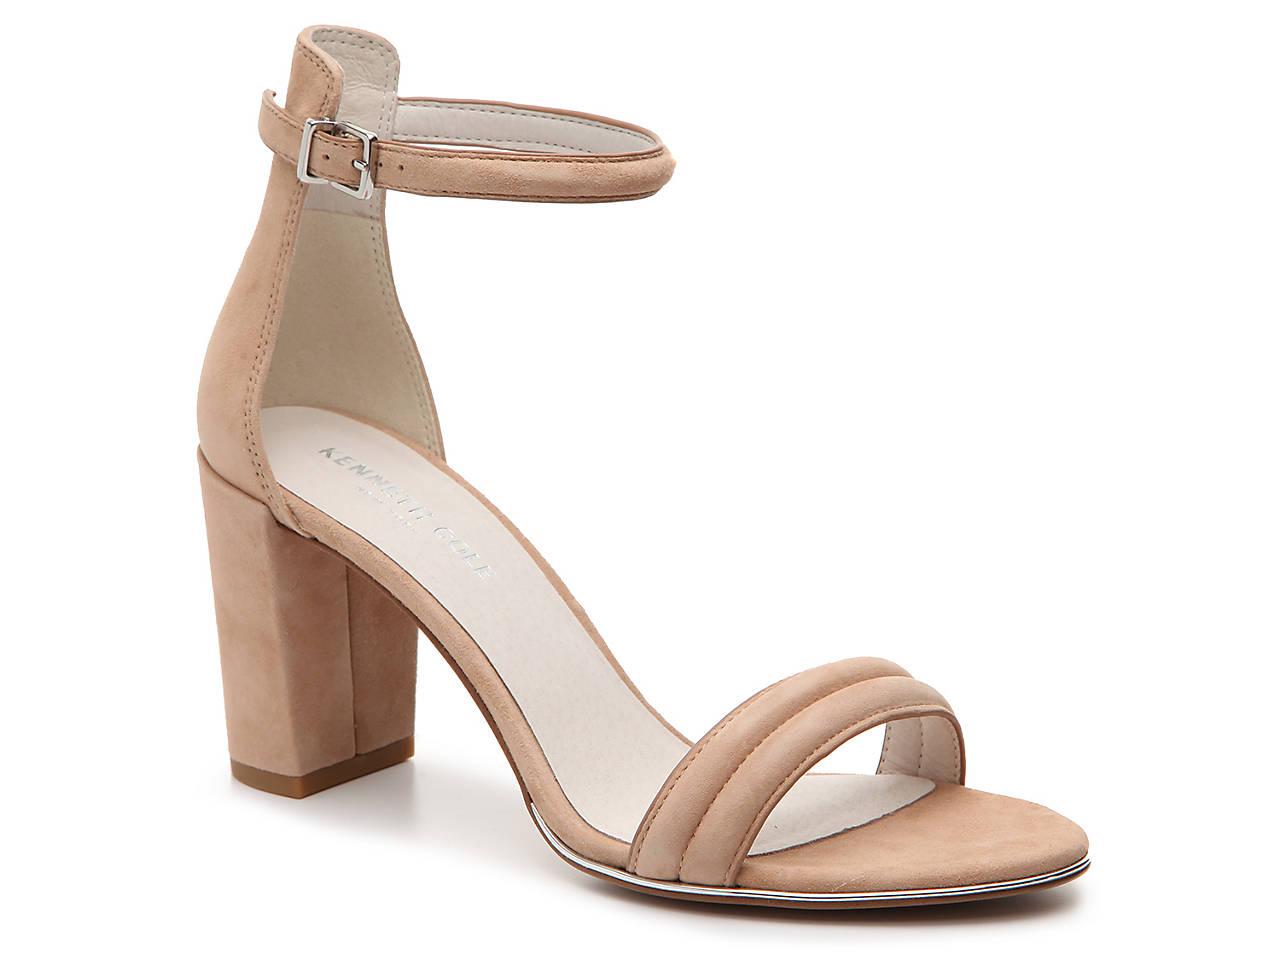 29a55ee487e Kenneth Cole New York Lex Sandal Women s Shoes